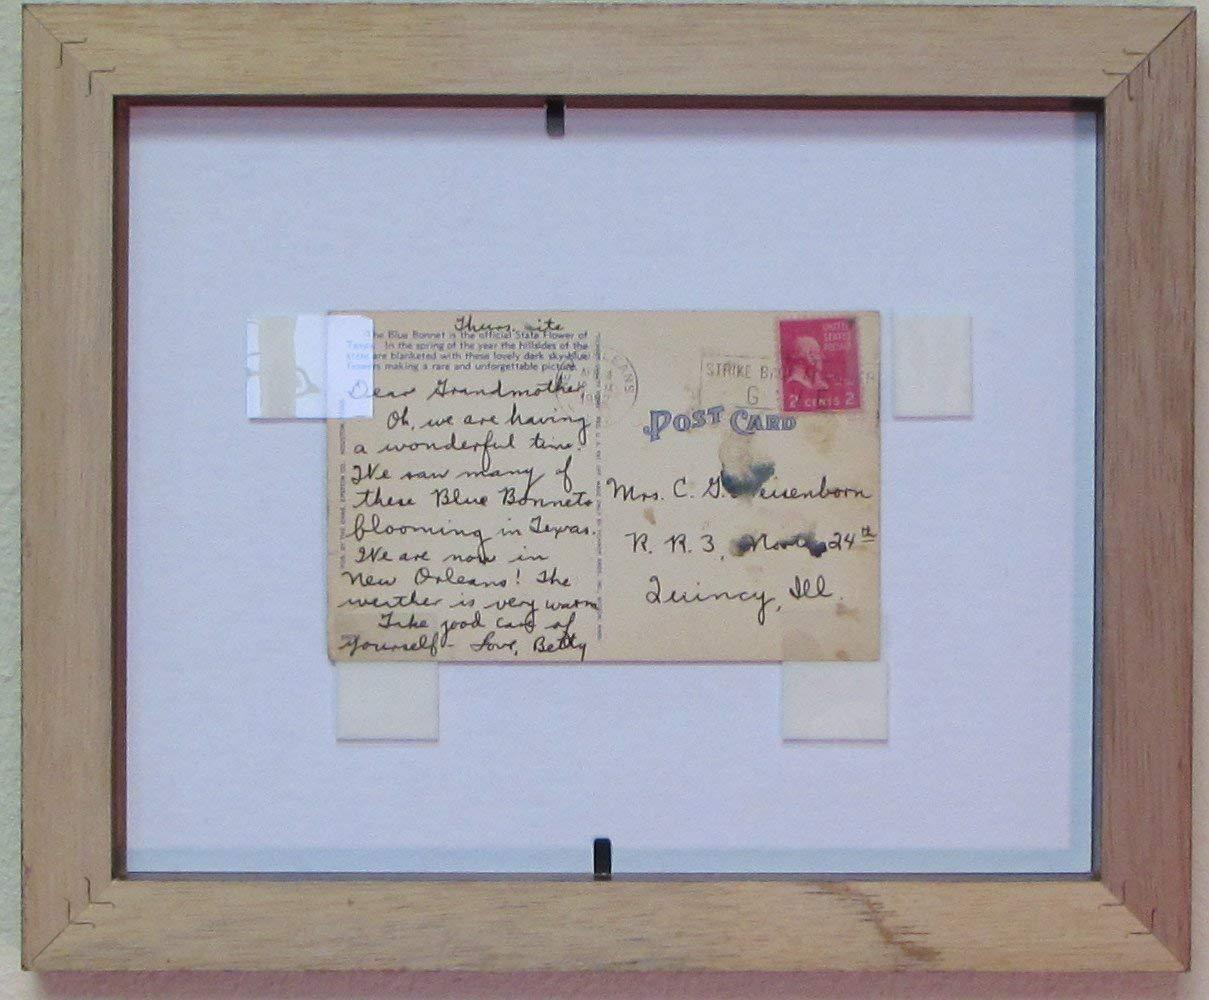 Postcard Frame Set for 3.5'' X 5.5'' Postcard Walnut Frame Tan (Black Trim) Matting